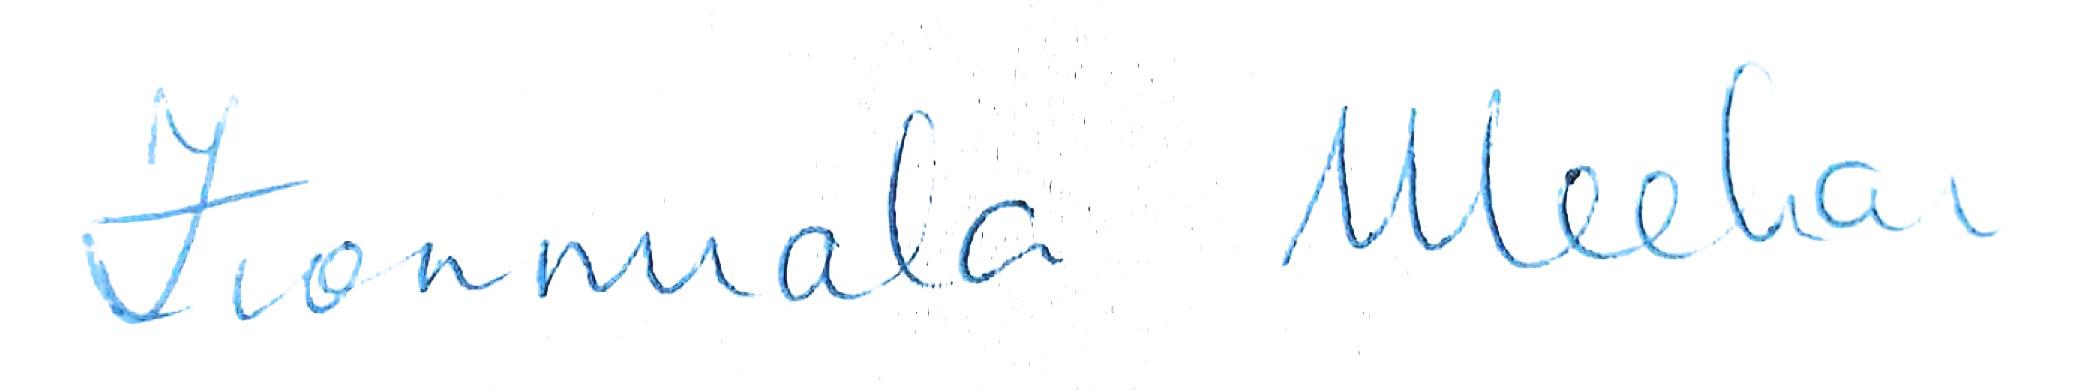 Fionnuala Meehan signature